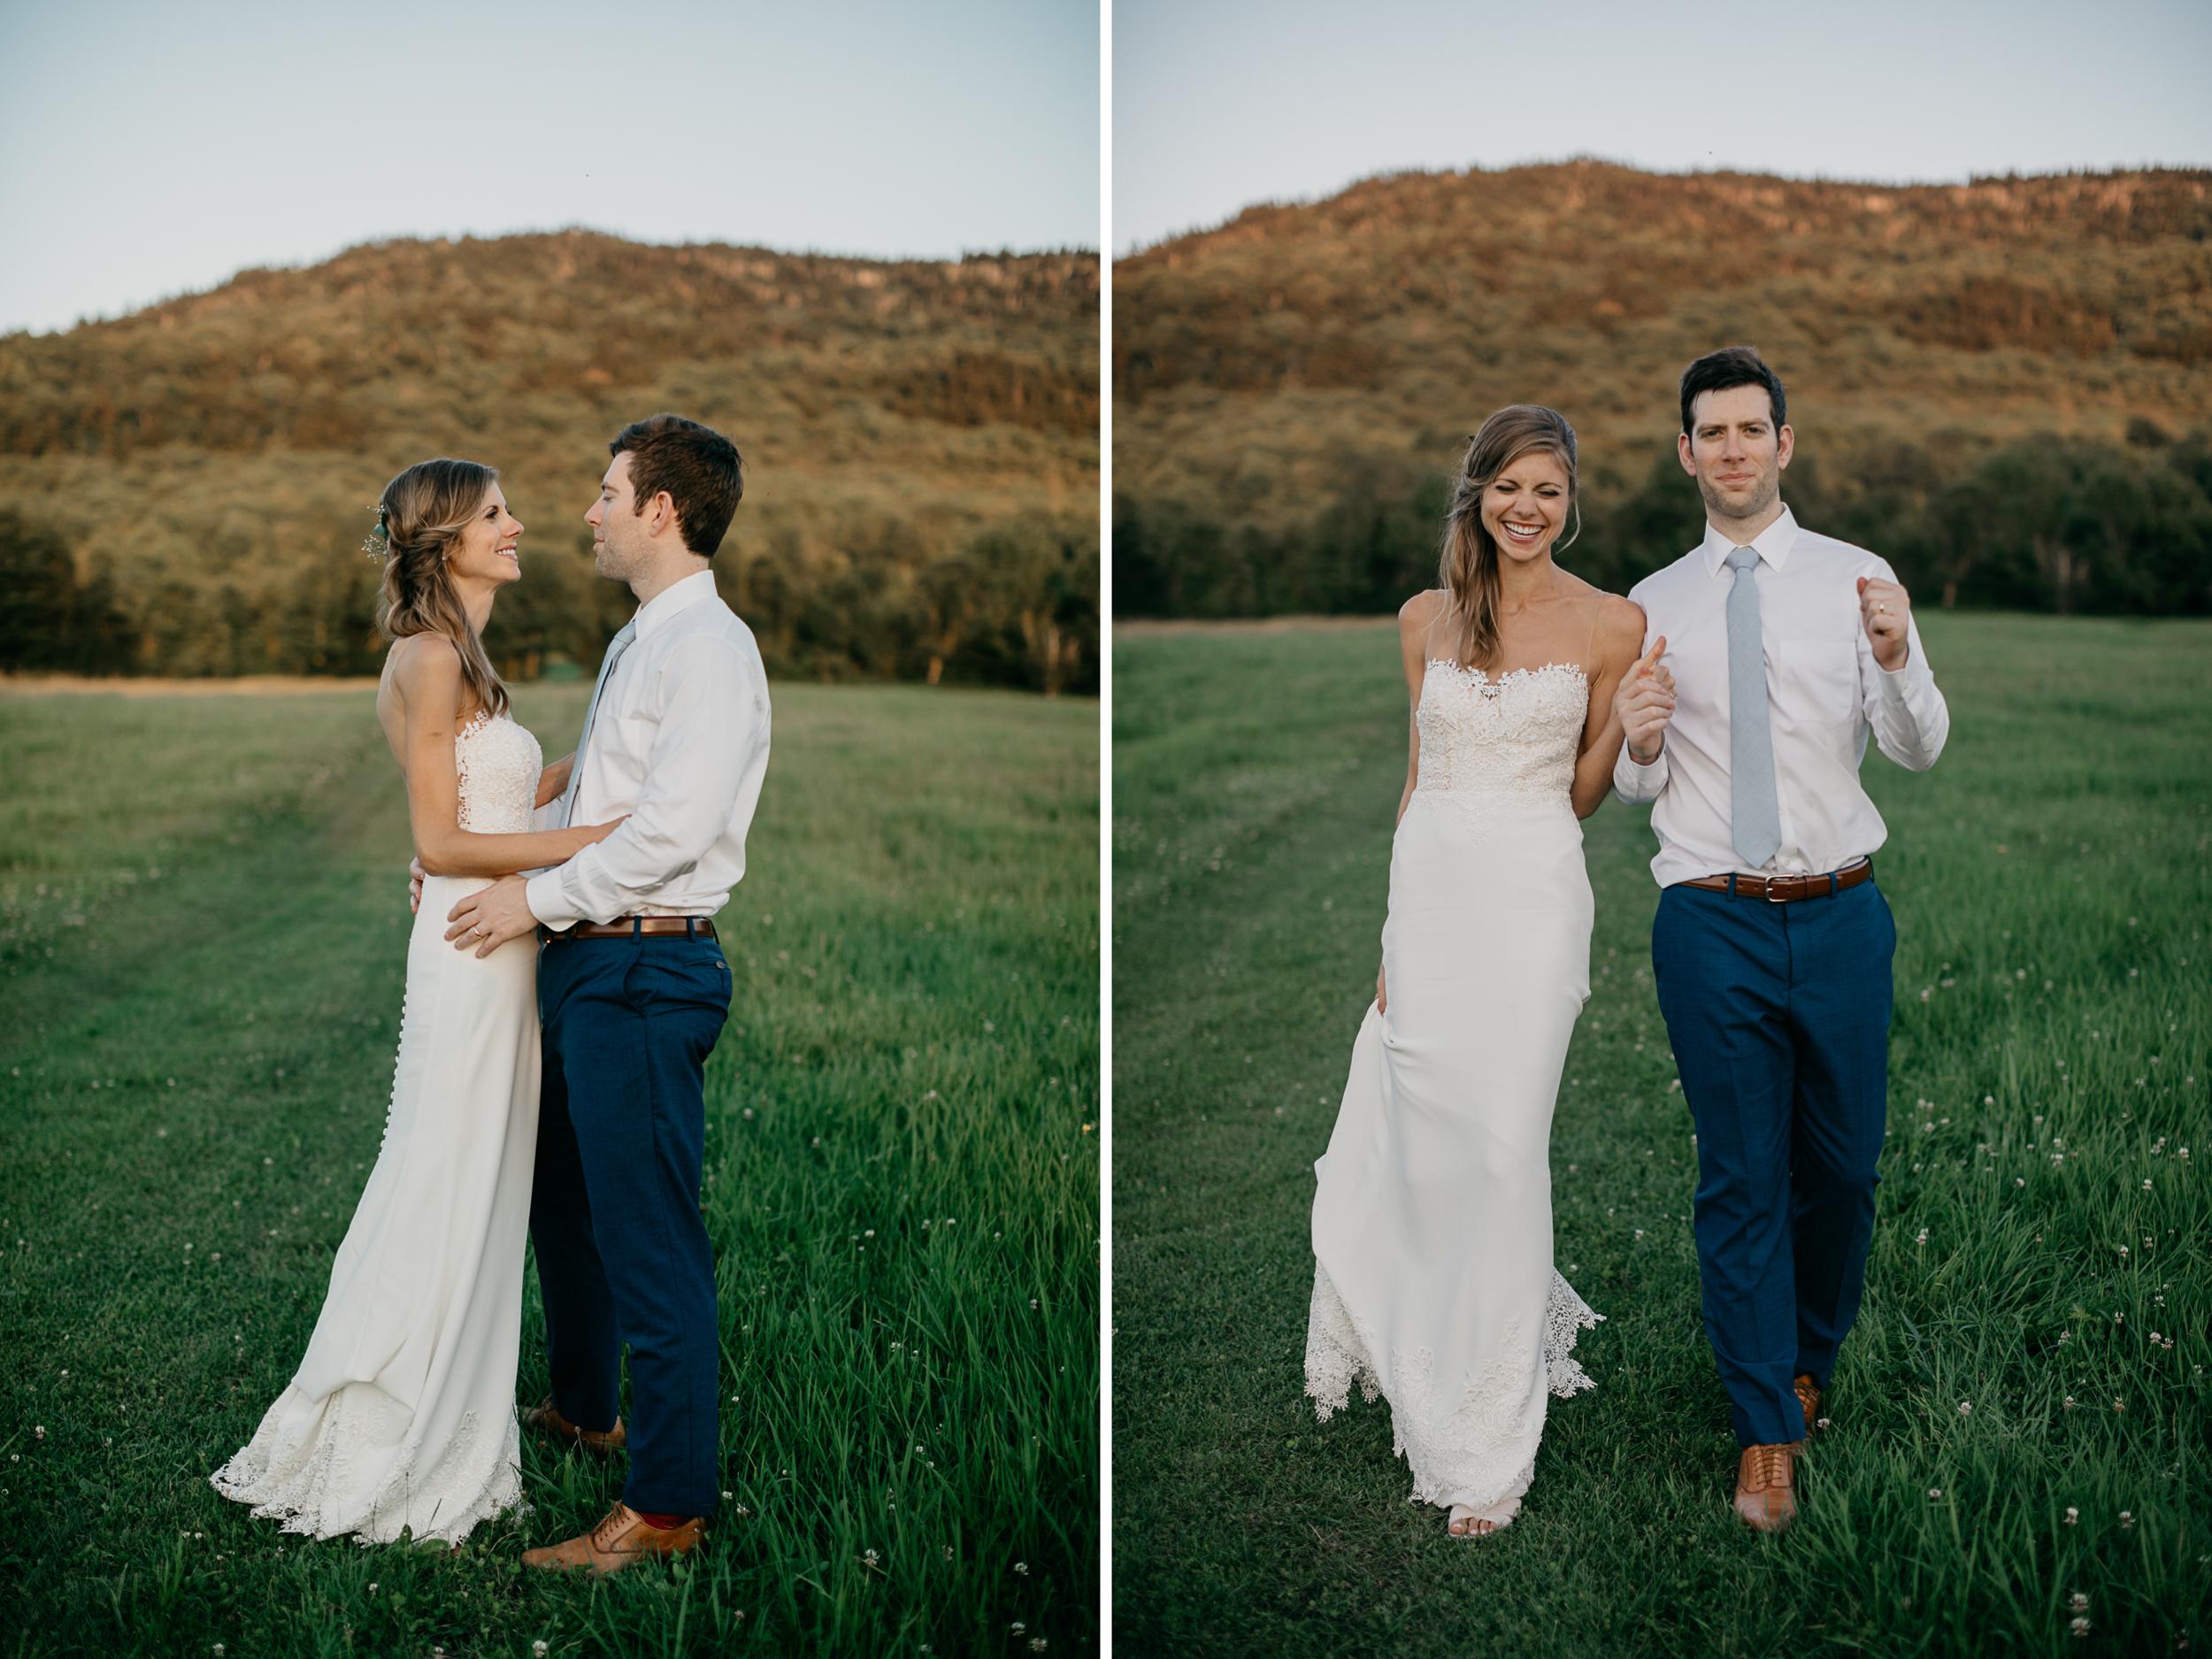 Karen_Alex_Bliss_ridge_farm_Vermont_wedding038.jpg